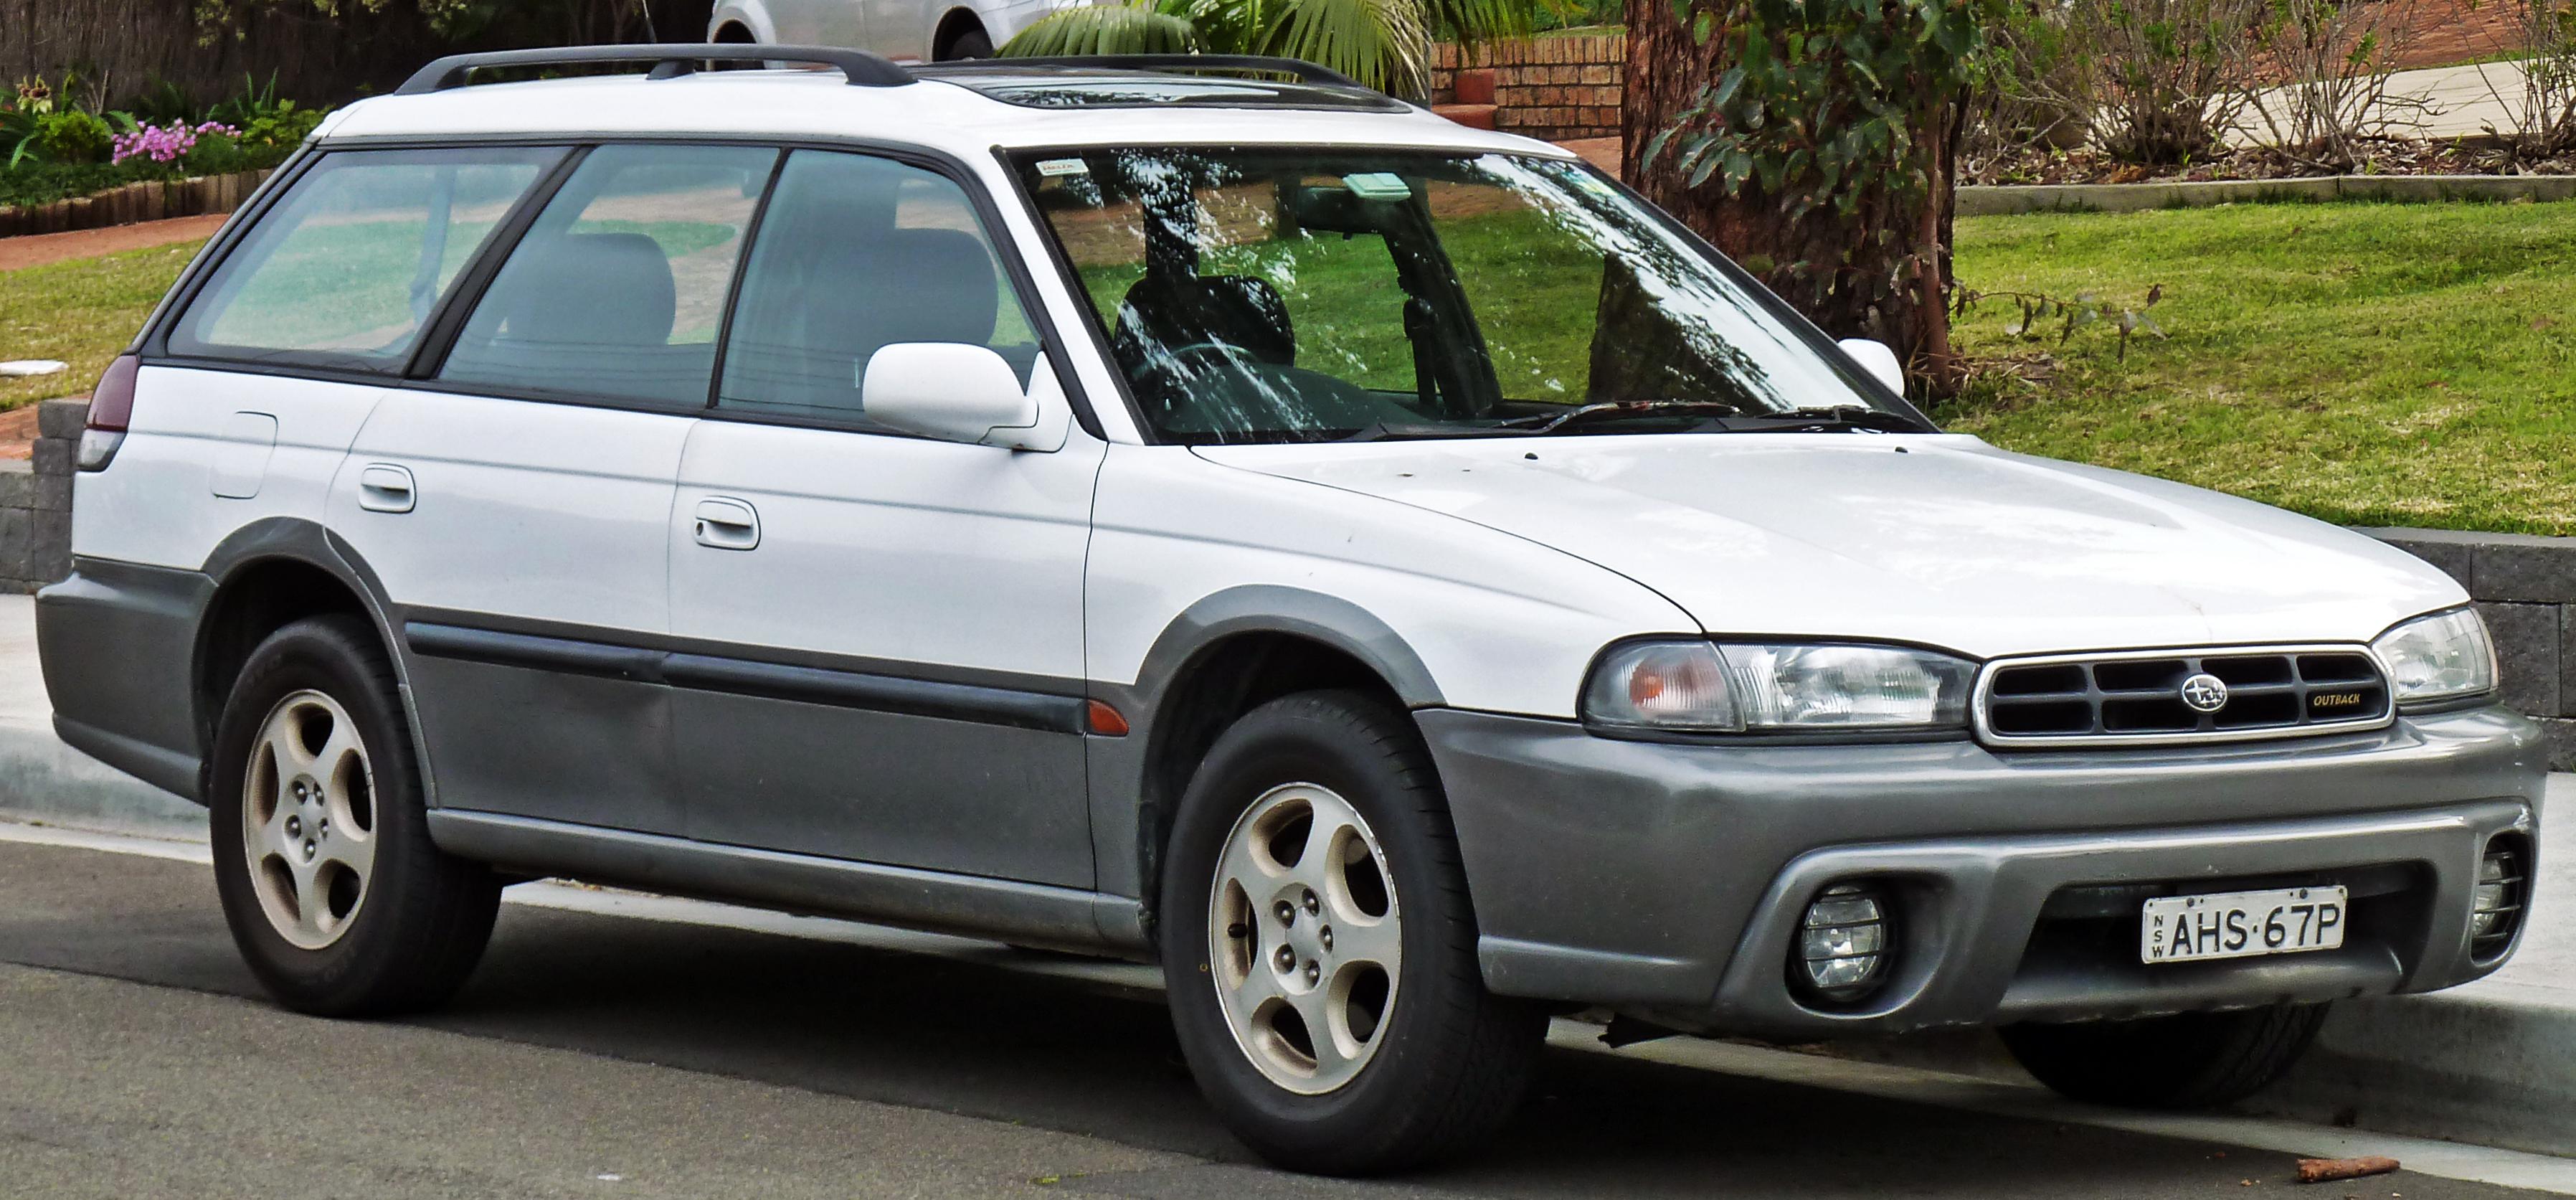 Subaru Outback Wikiwand